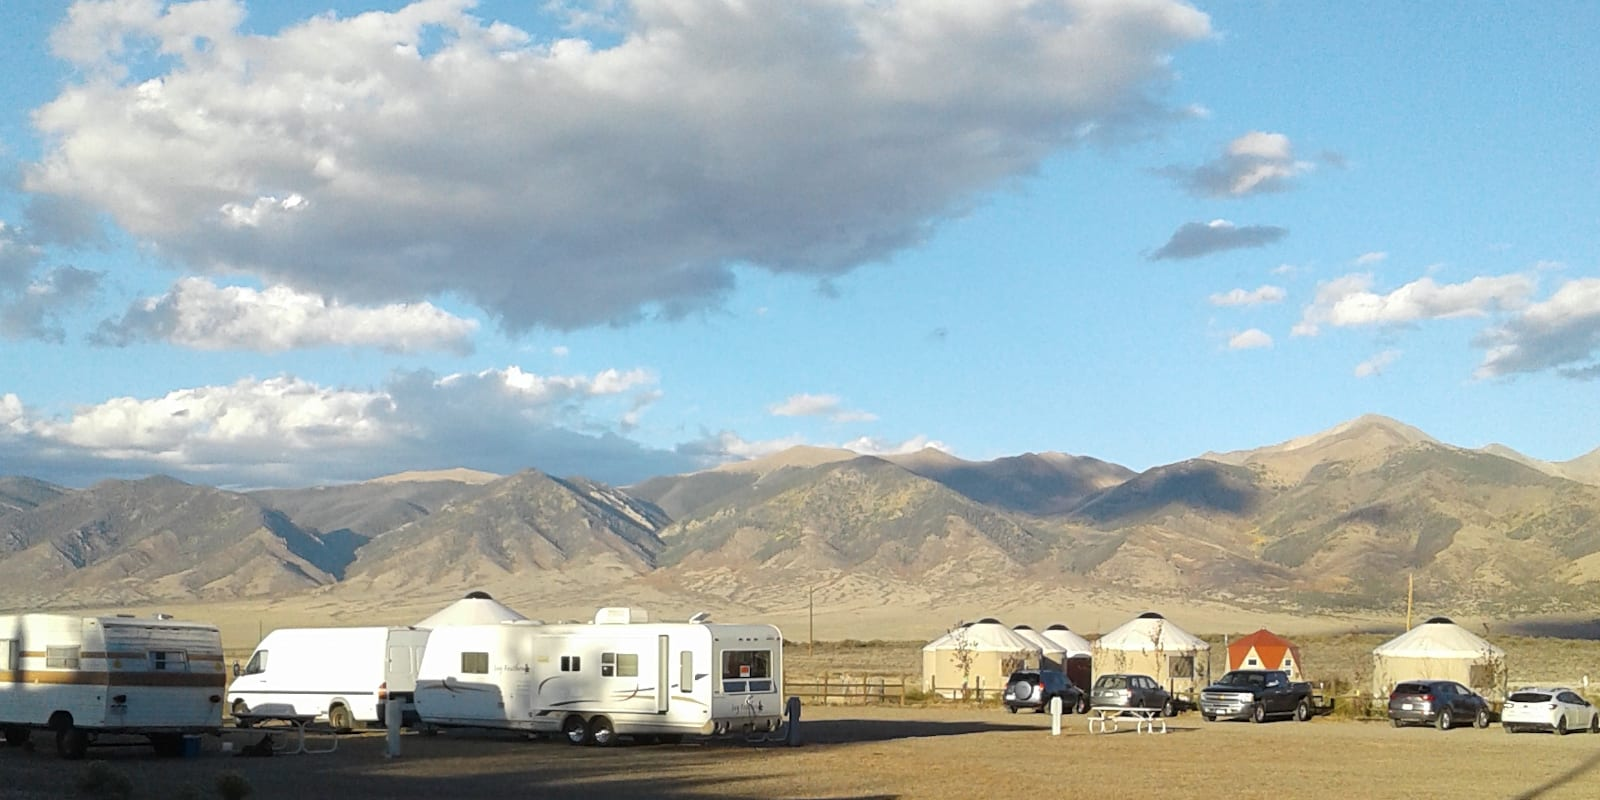 RVs Camping Joyful Journey Hot Springs Colorado